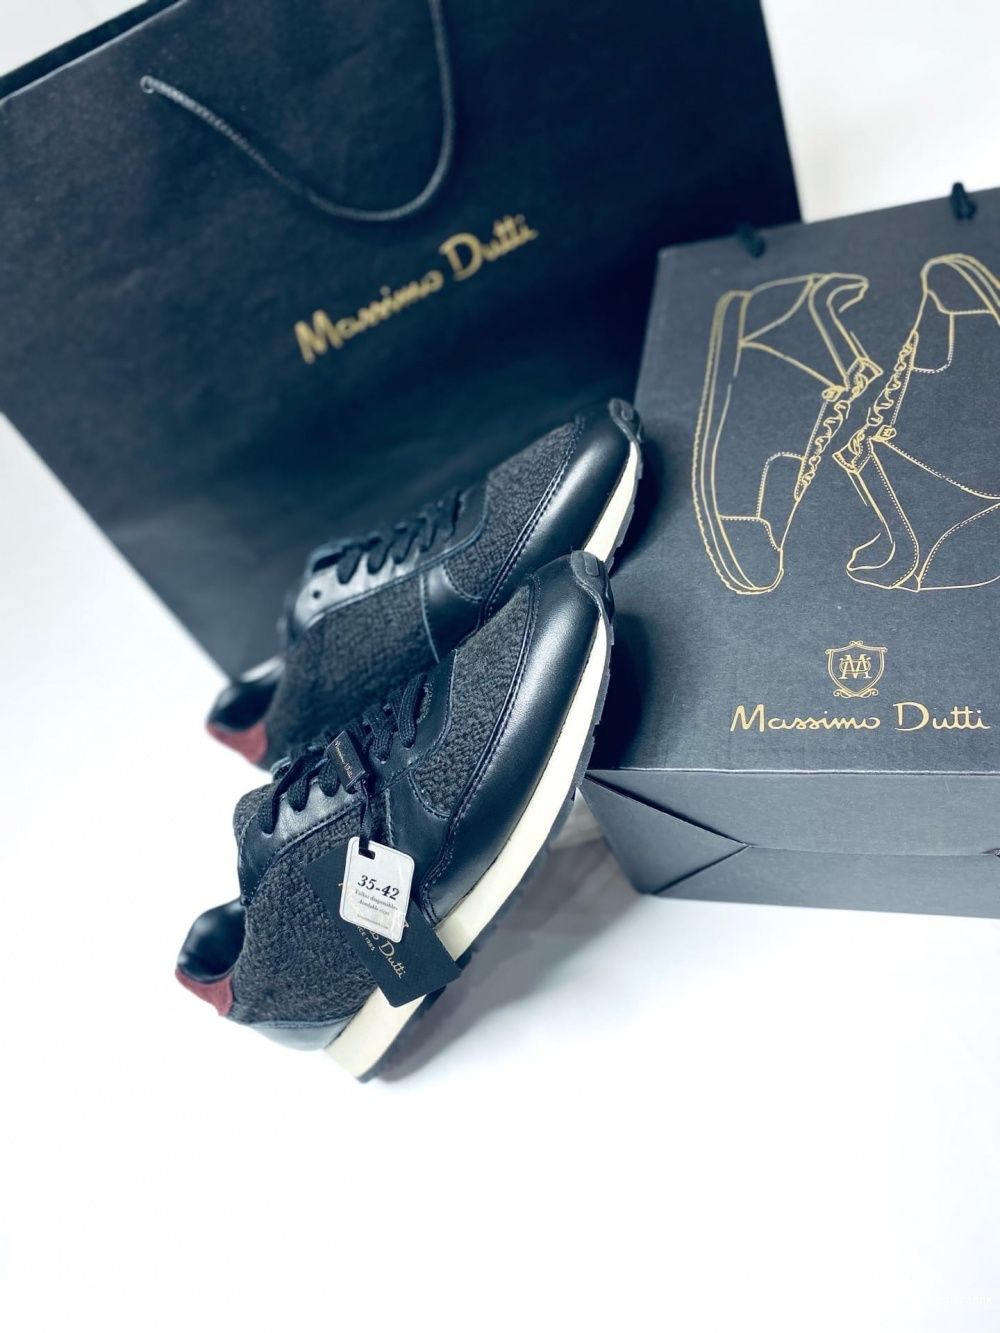 Кроссовки Massimo Dutti 36 размер массимо